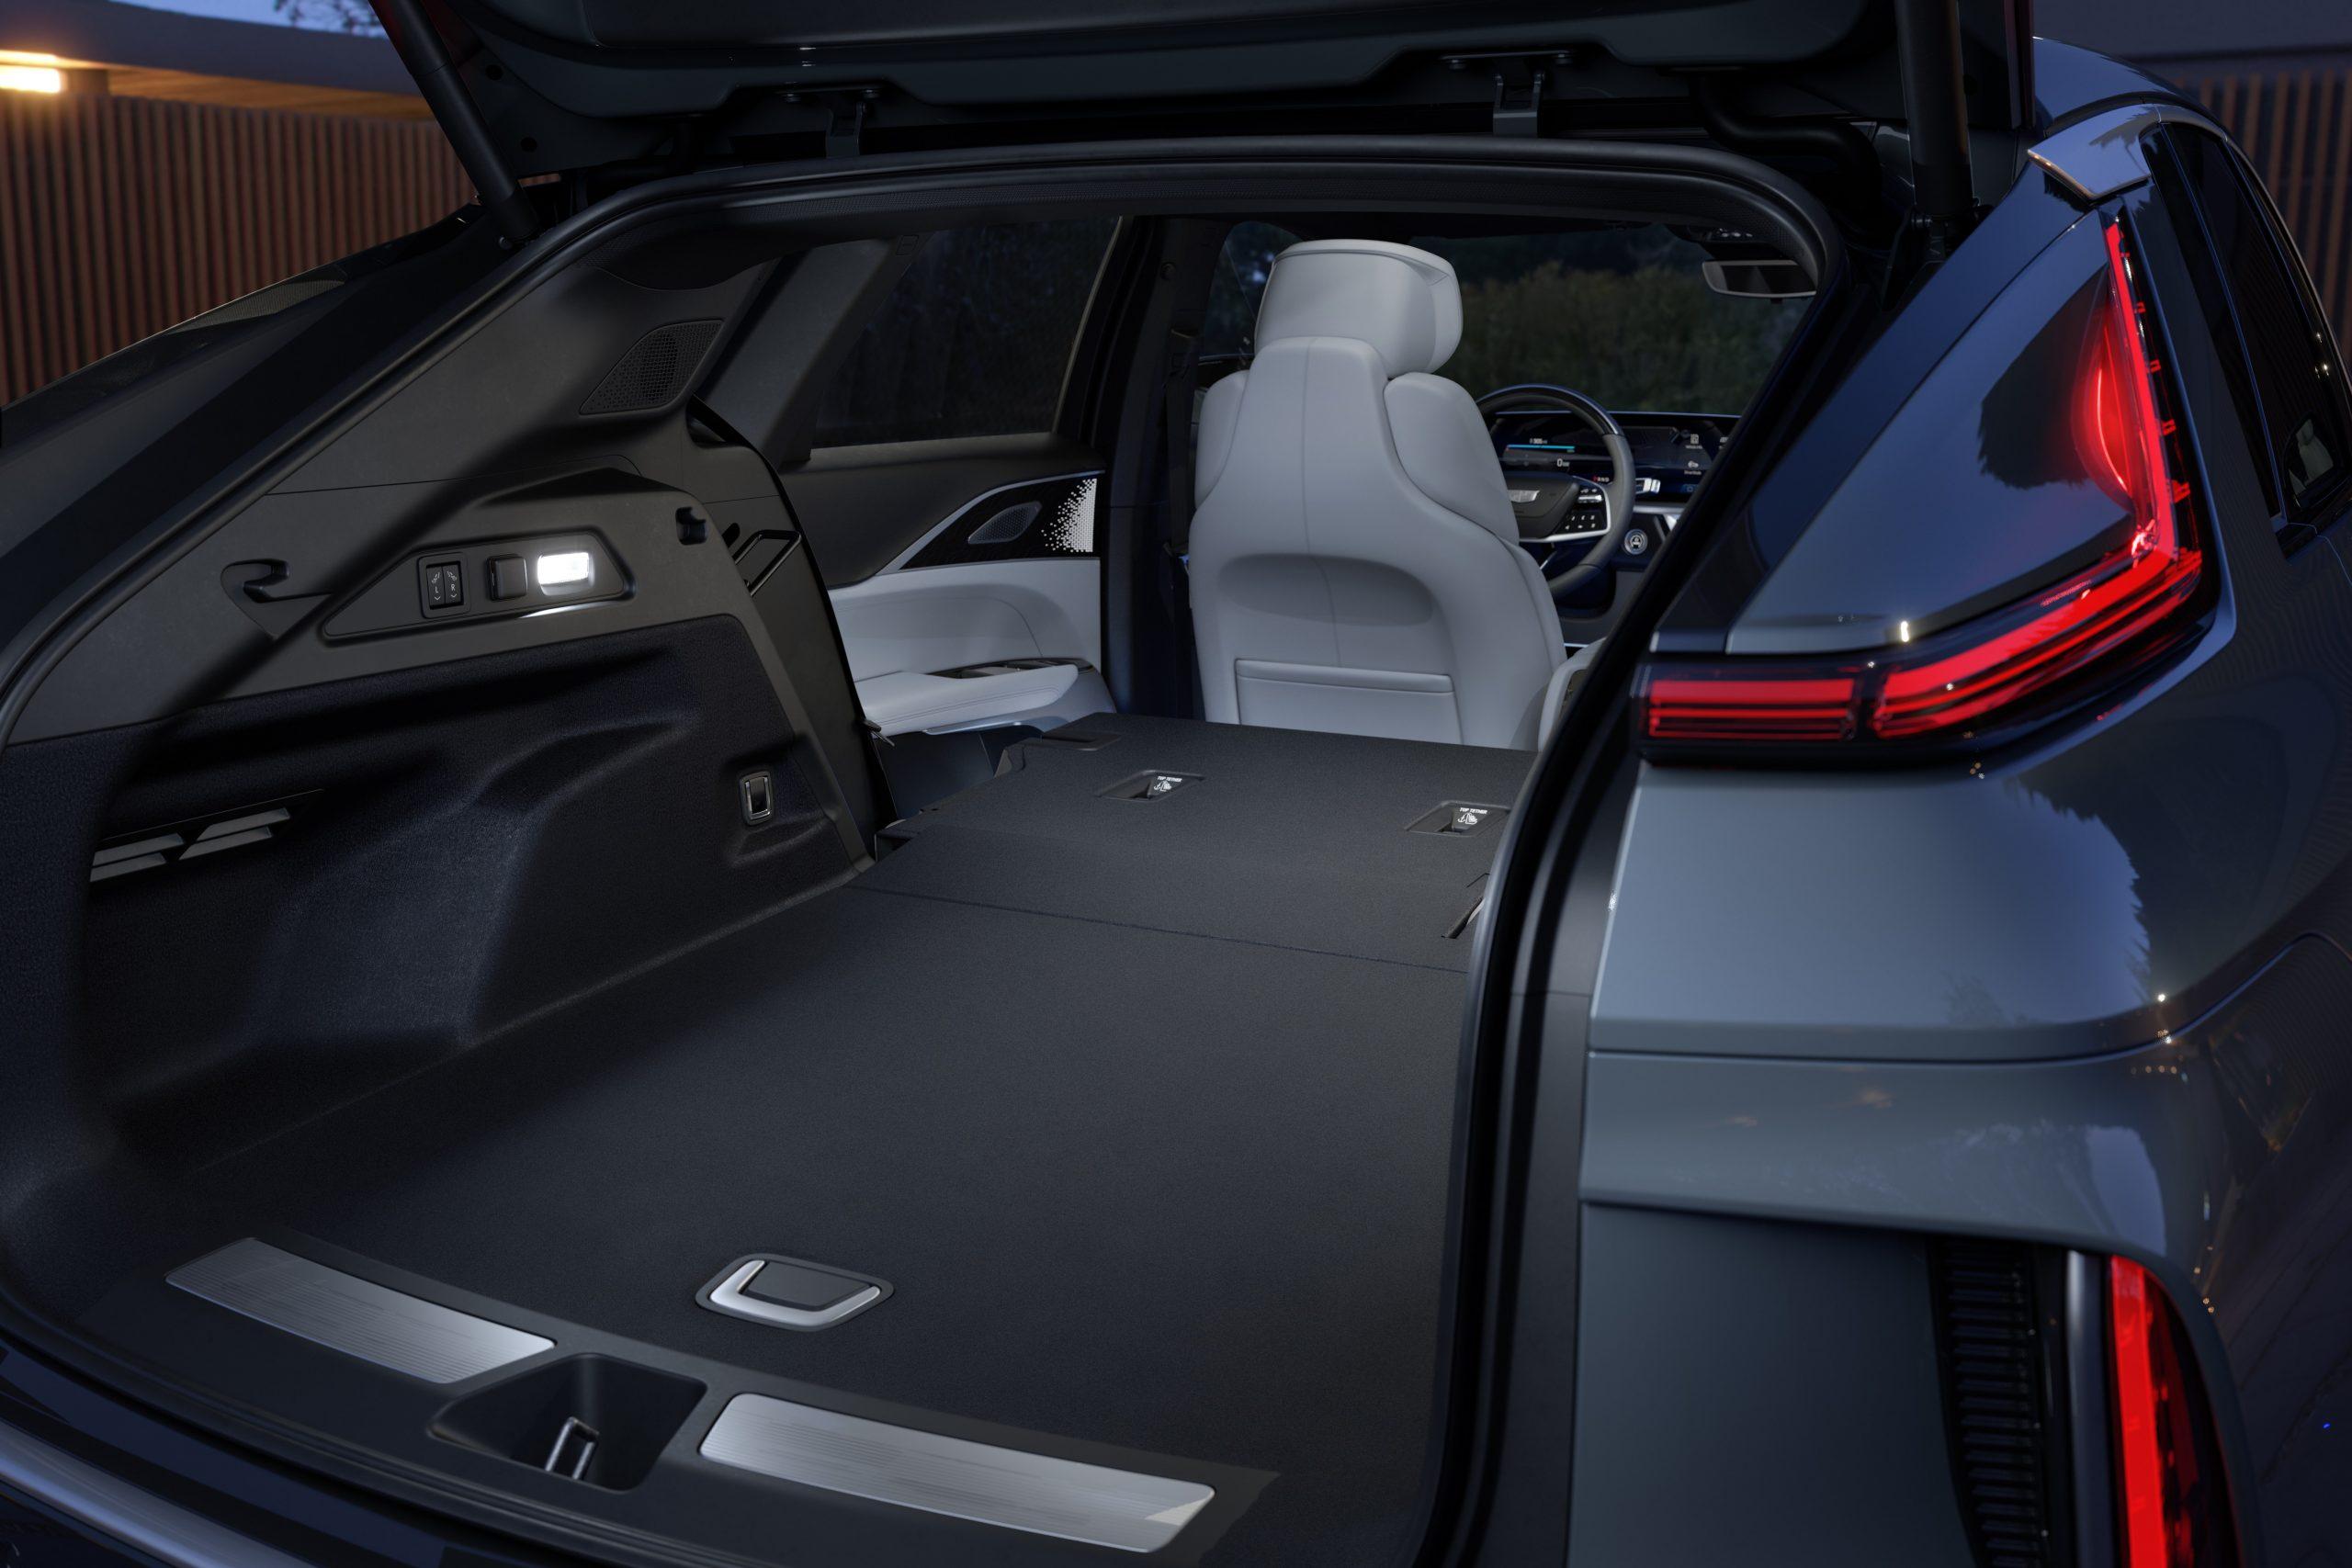 2023 Lyriq interior rear seats folded